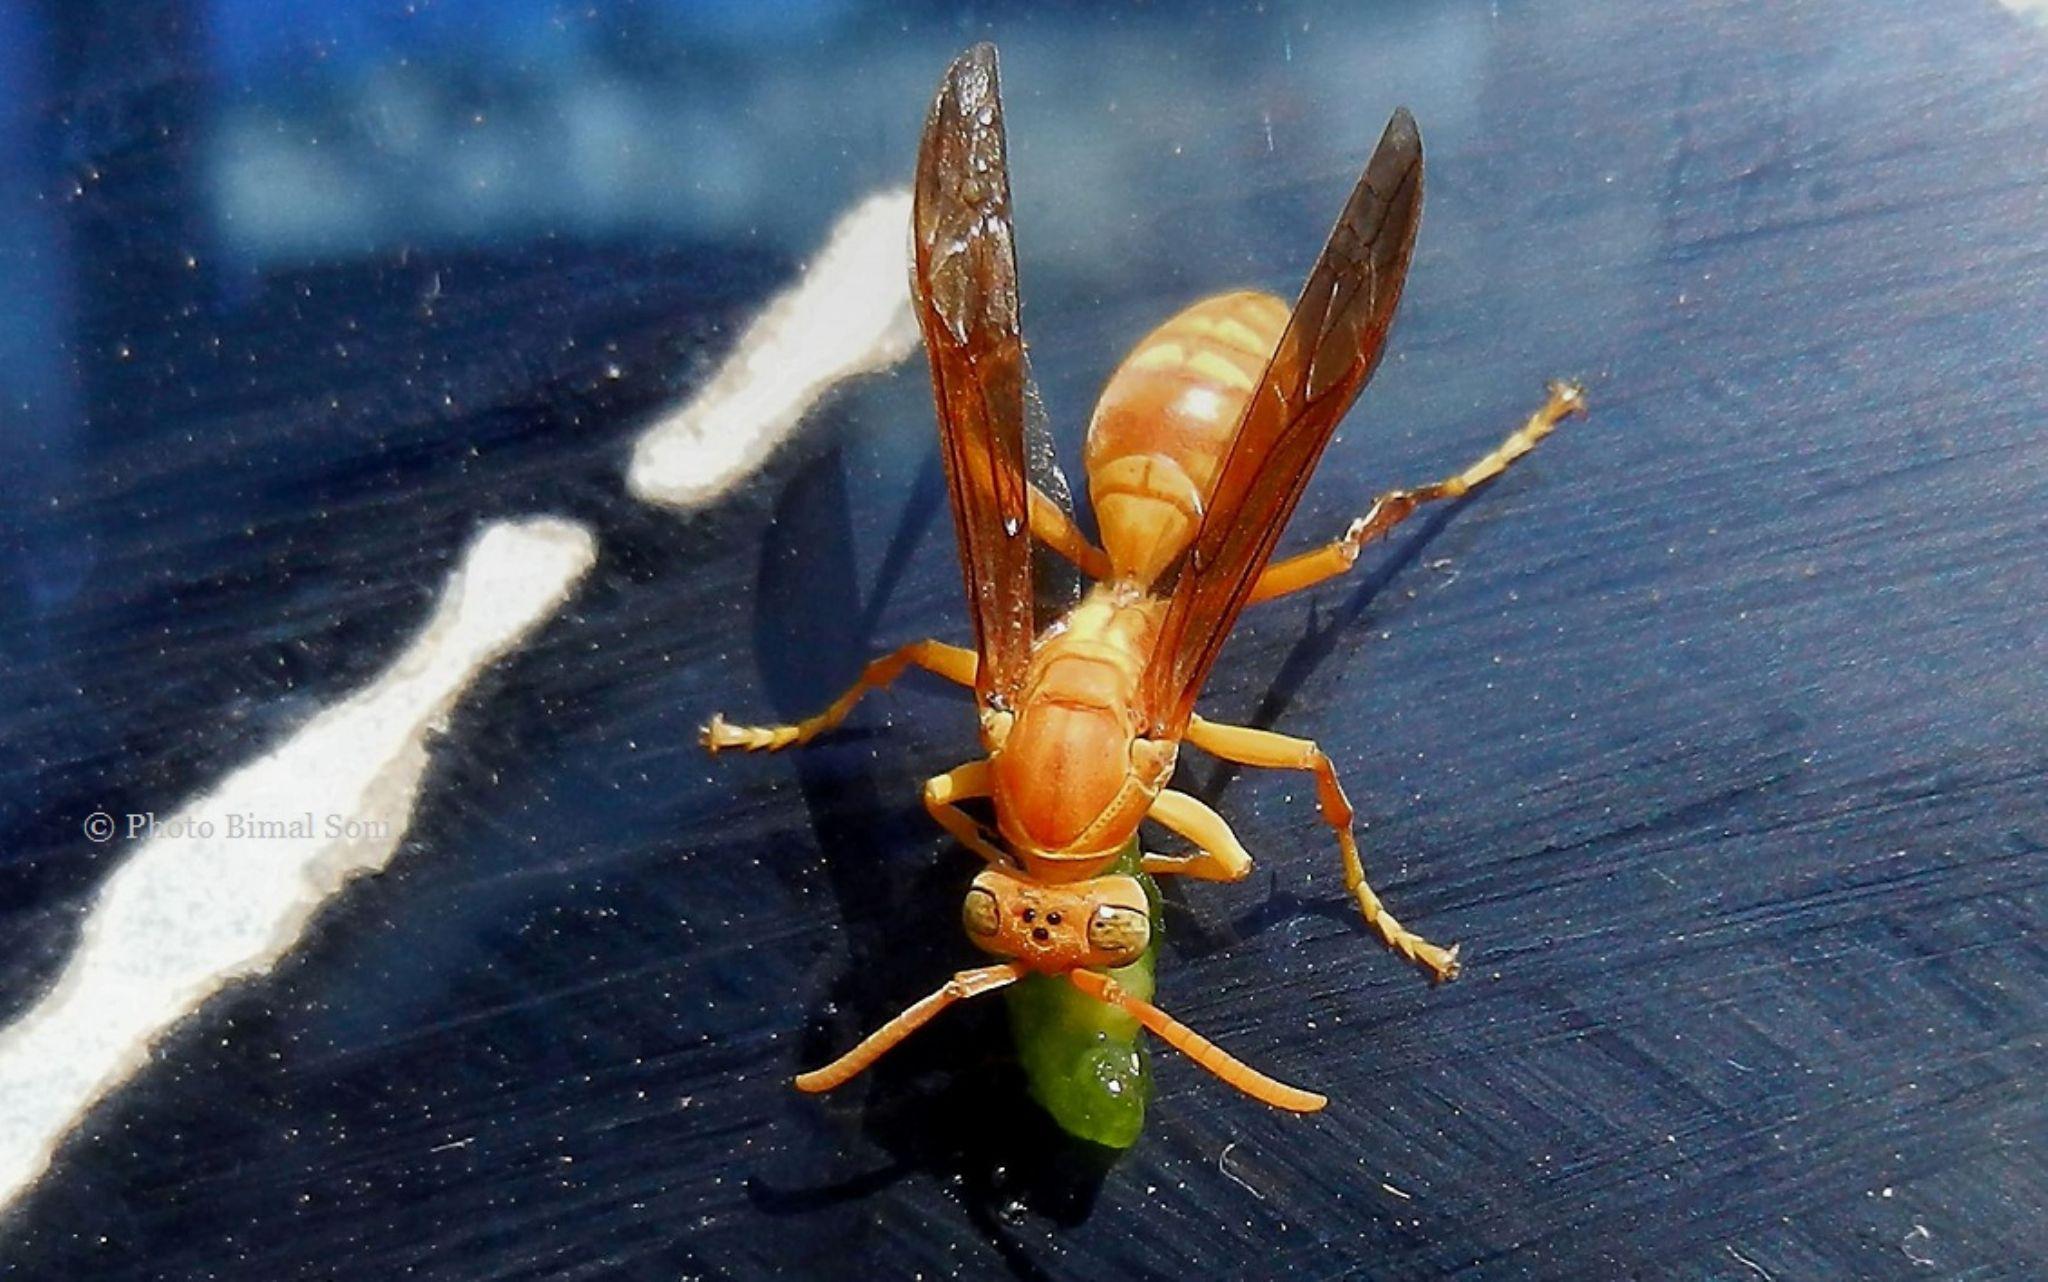 Yellow_Wasp by Bimal Soni